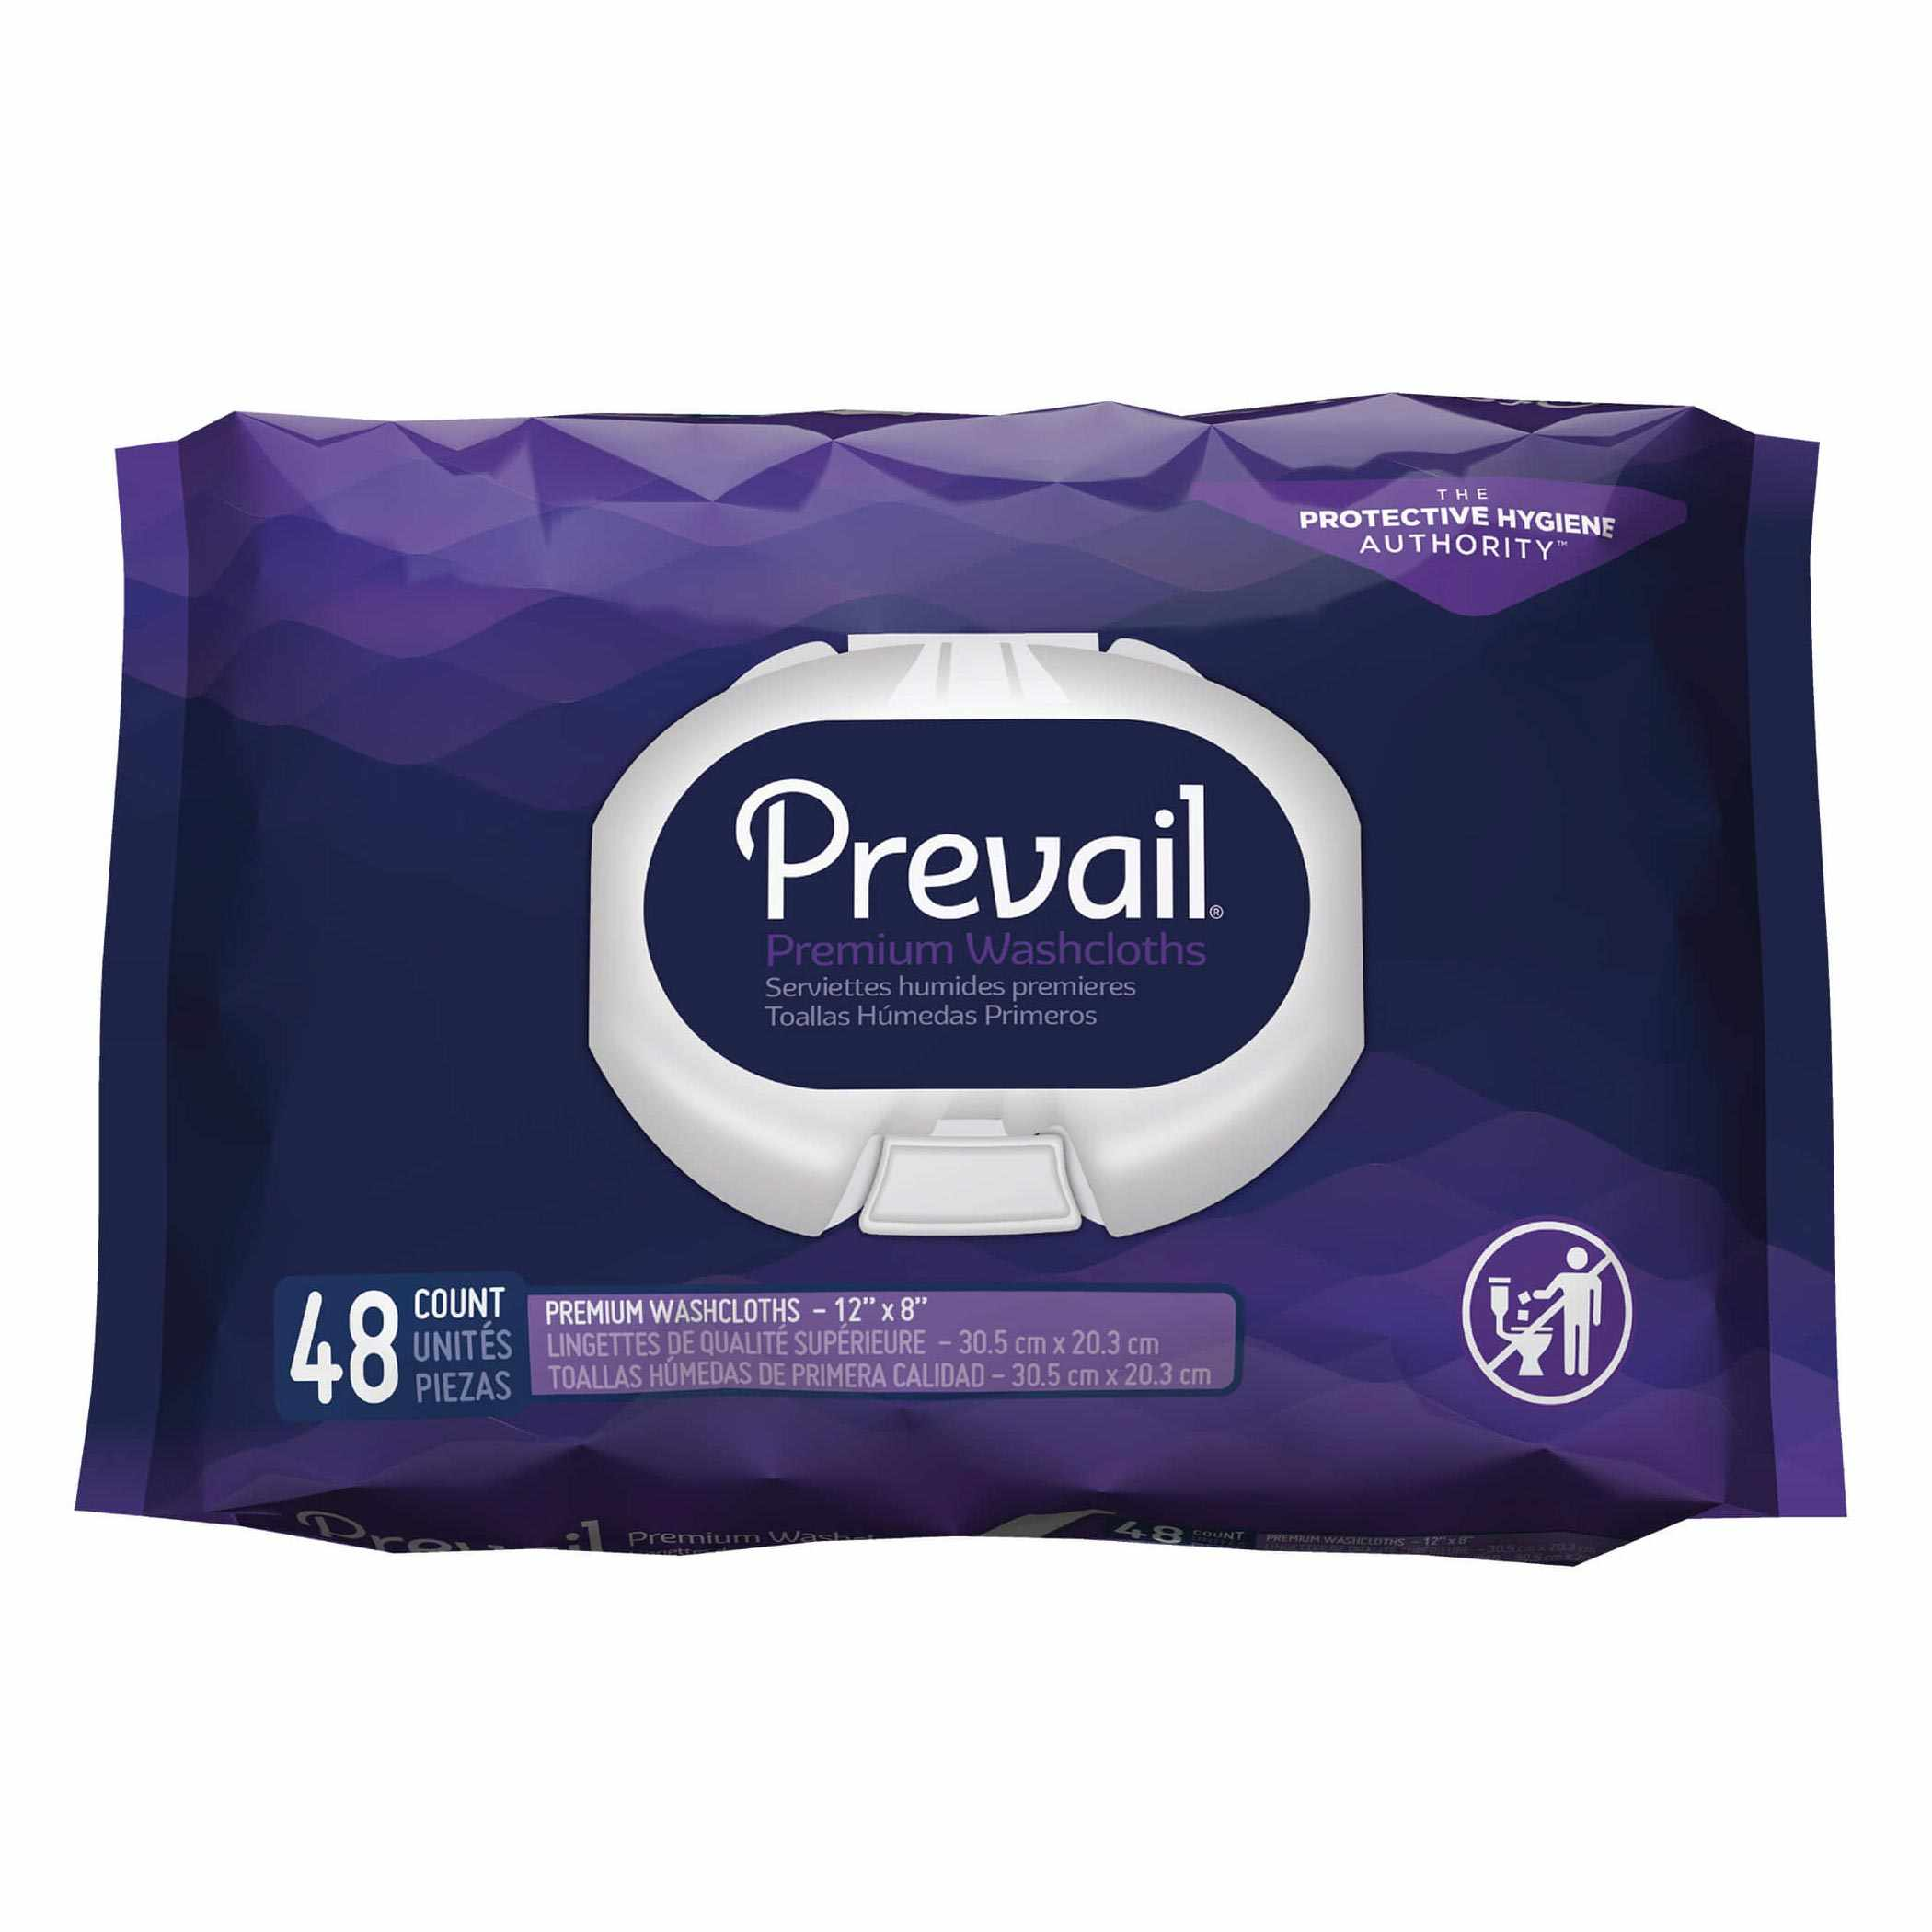 "Prevail premium cotton washcloth soft pak 12"" x 8"""